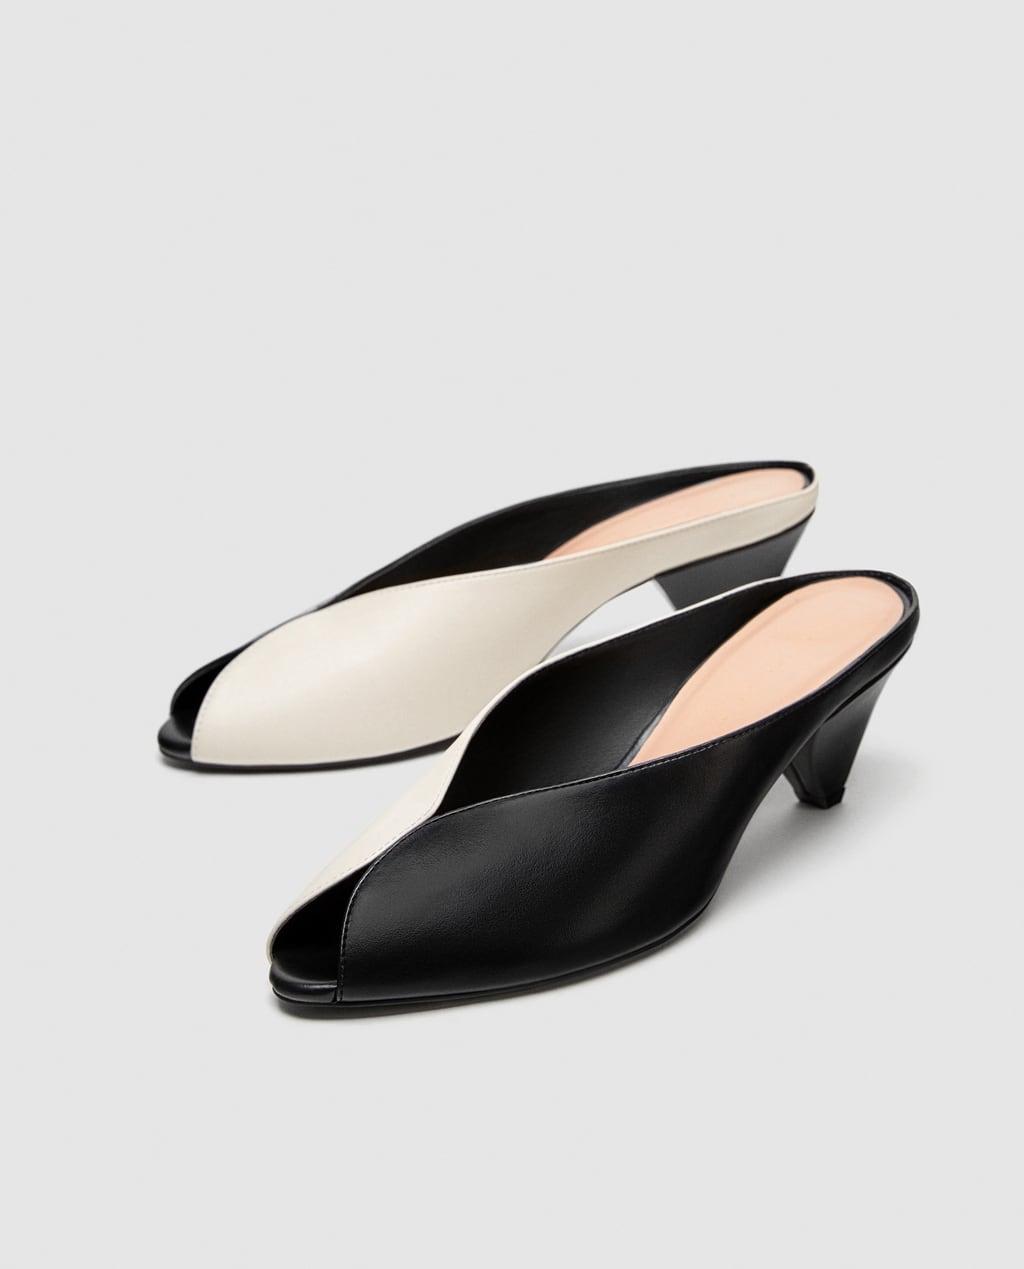 https://www.zara.com/ca/en/cone-heel-mules-p13225301.html?v1=5305435#selectedColor=202&origin=shopcart